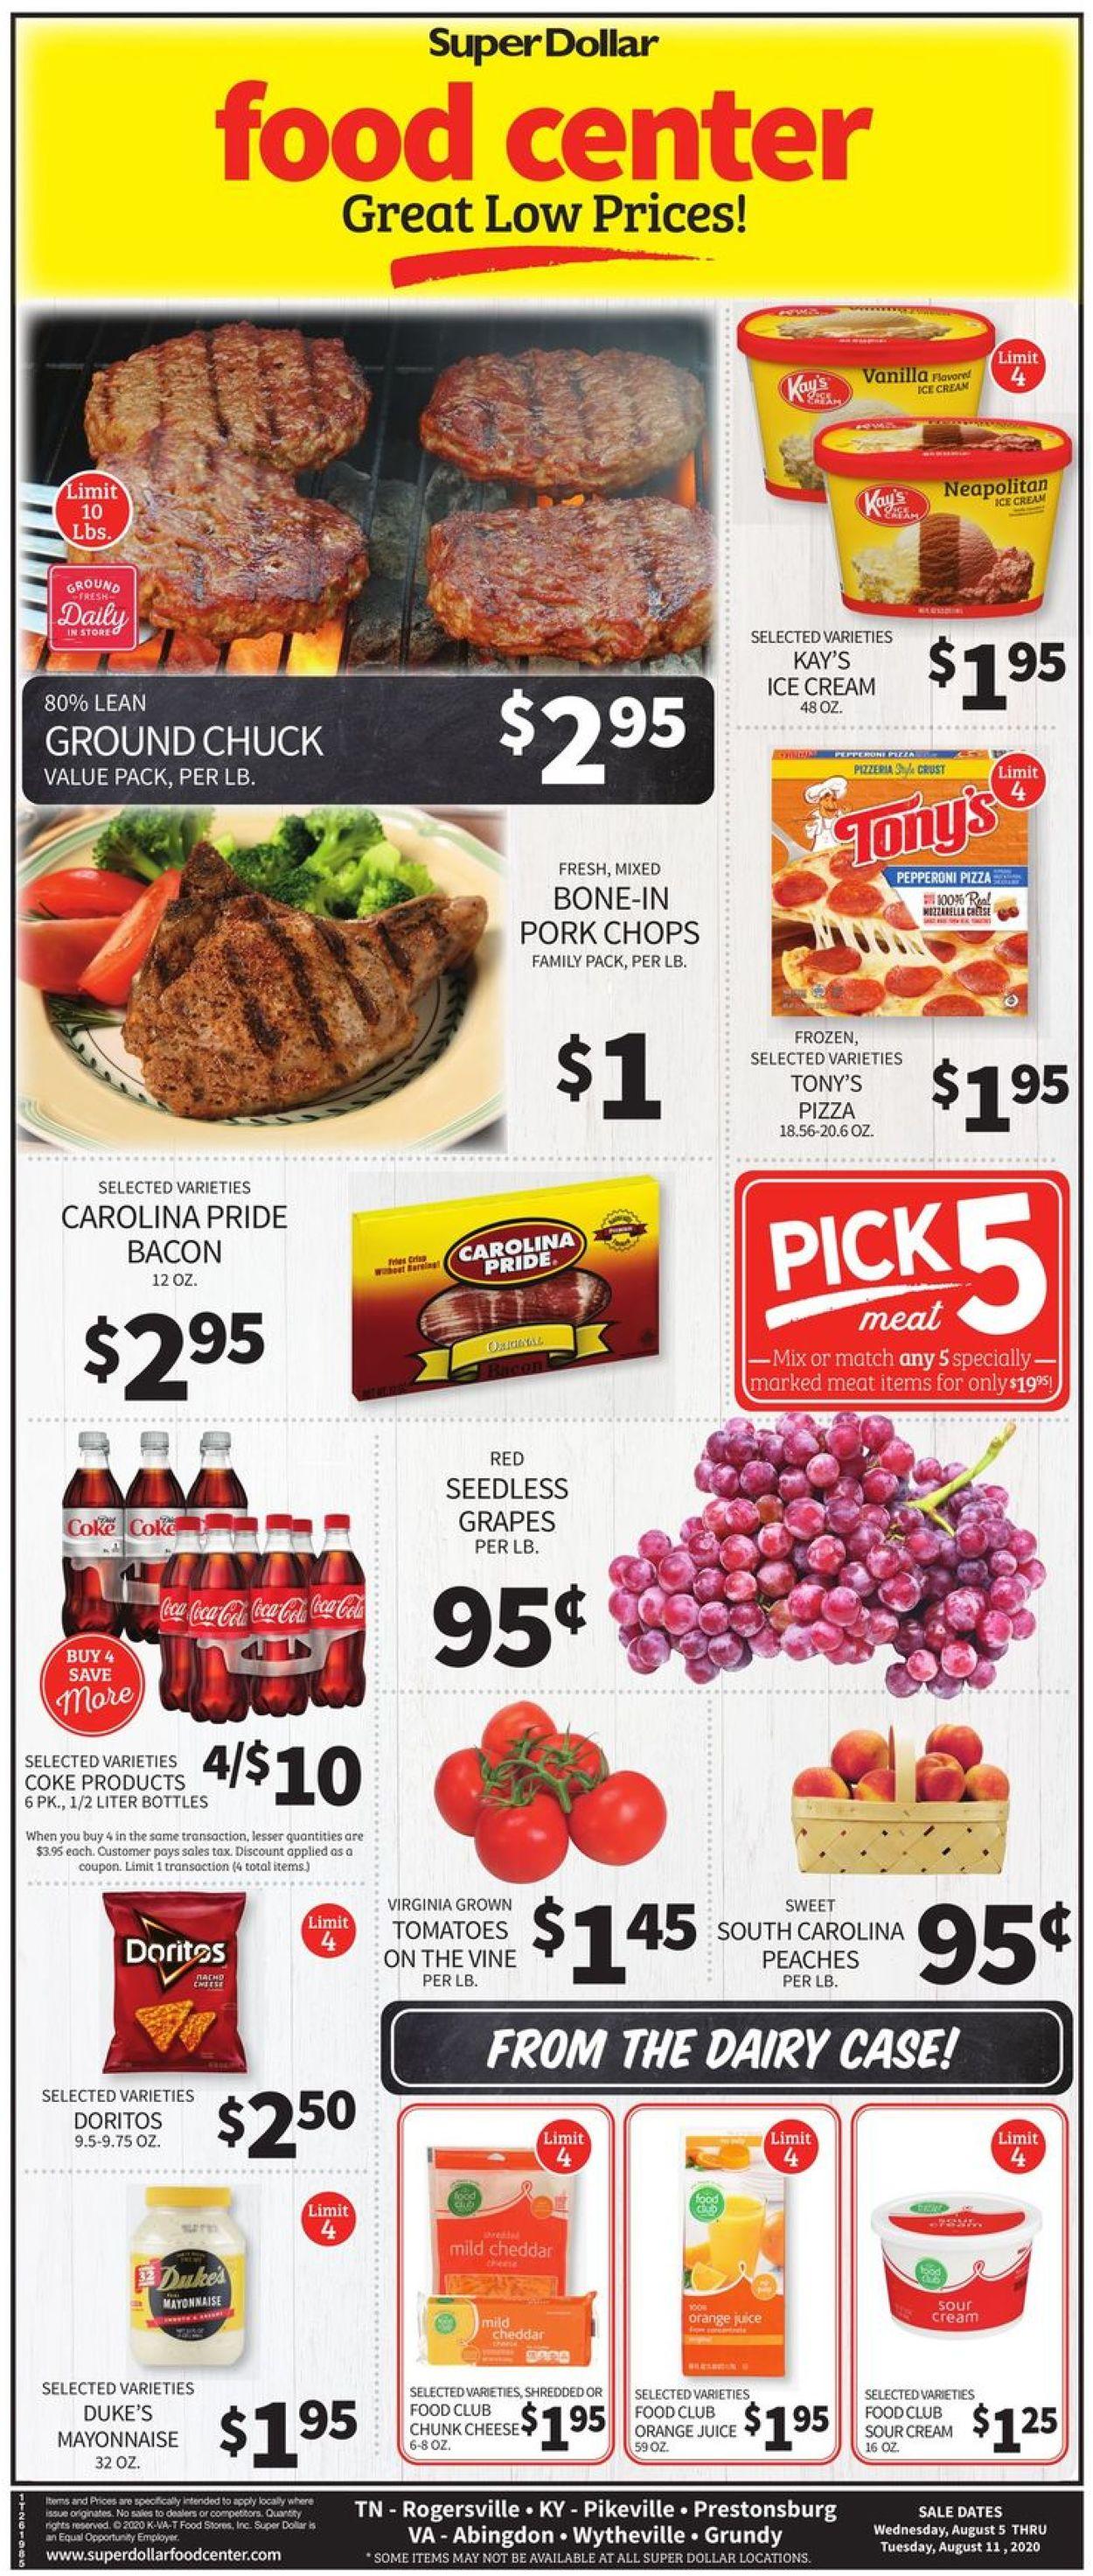 Super Dollar Food Center Weekly Ad Circular - valid 08/05-08/11/2020